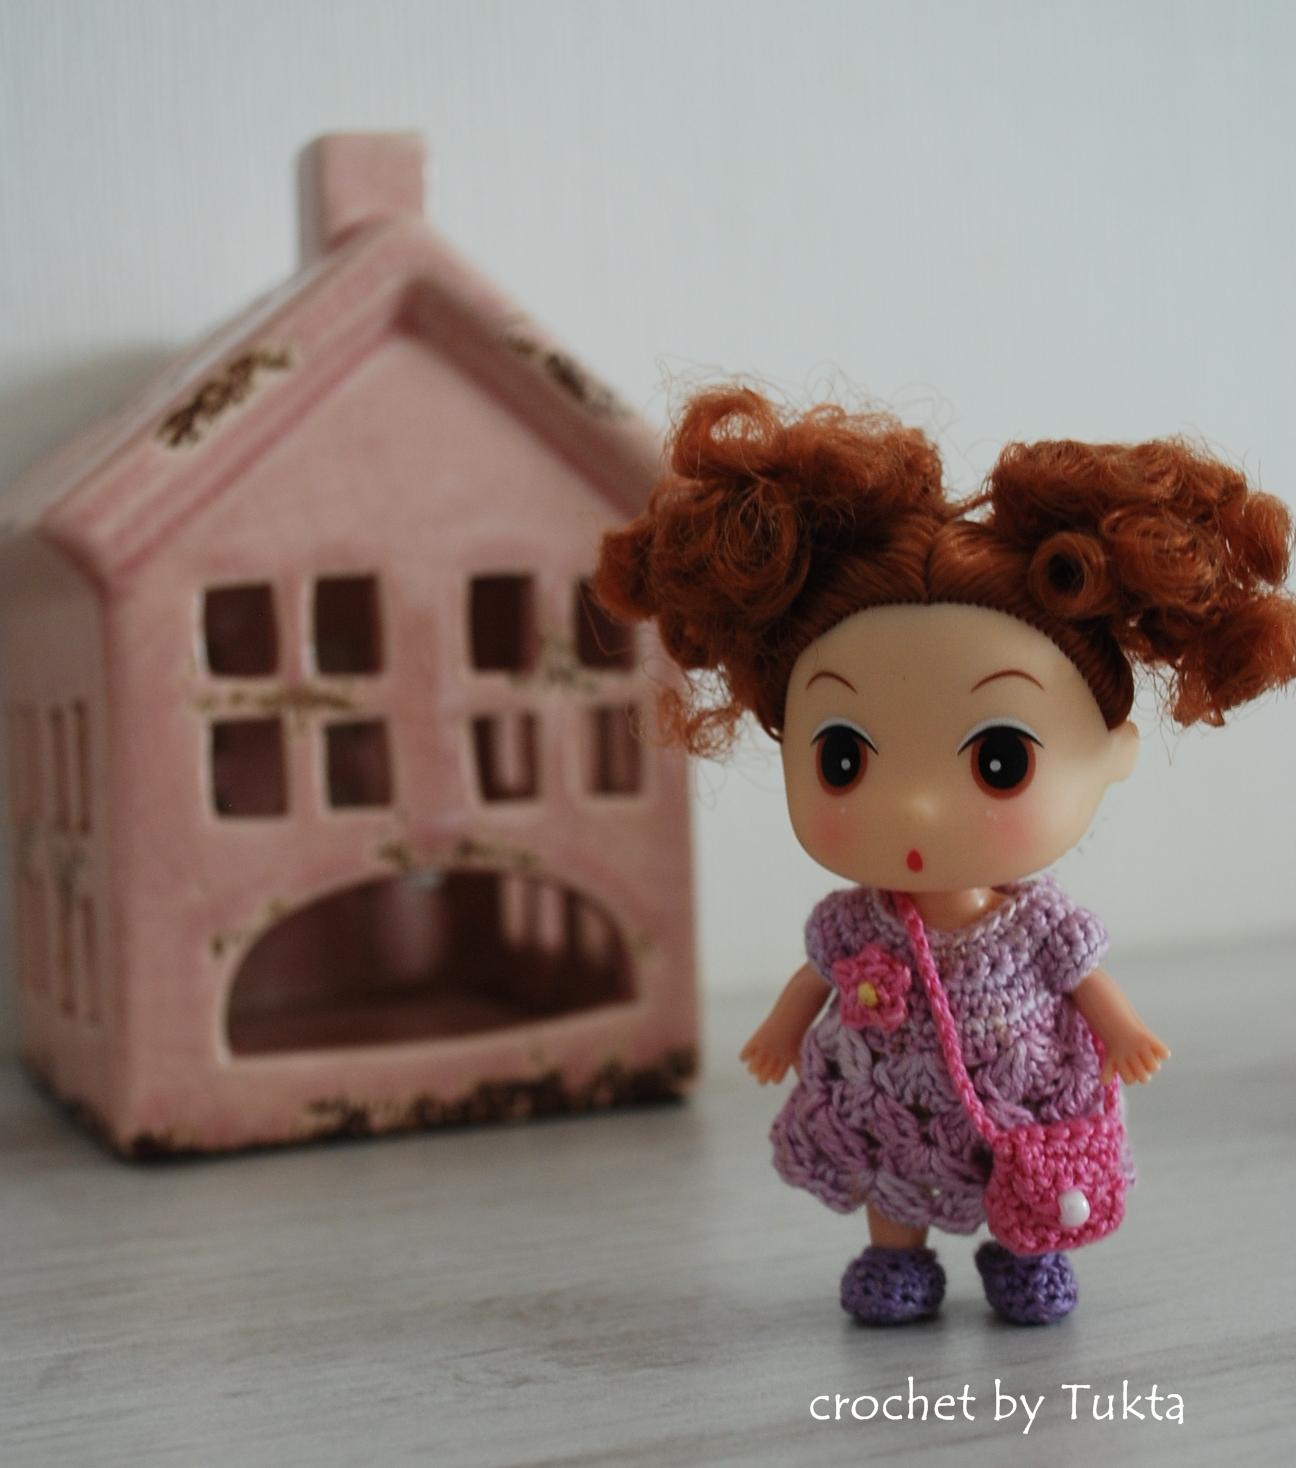 Crochet by Tukta: mini doll